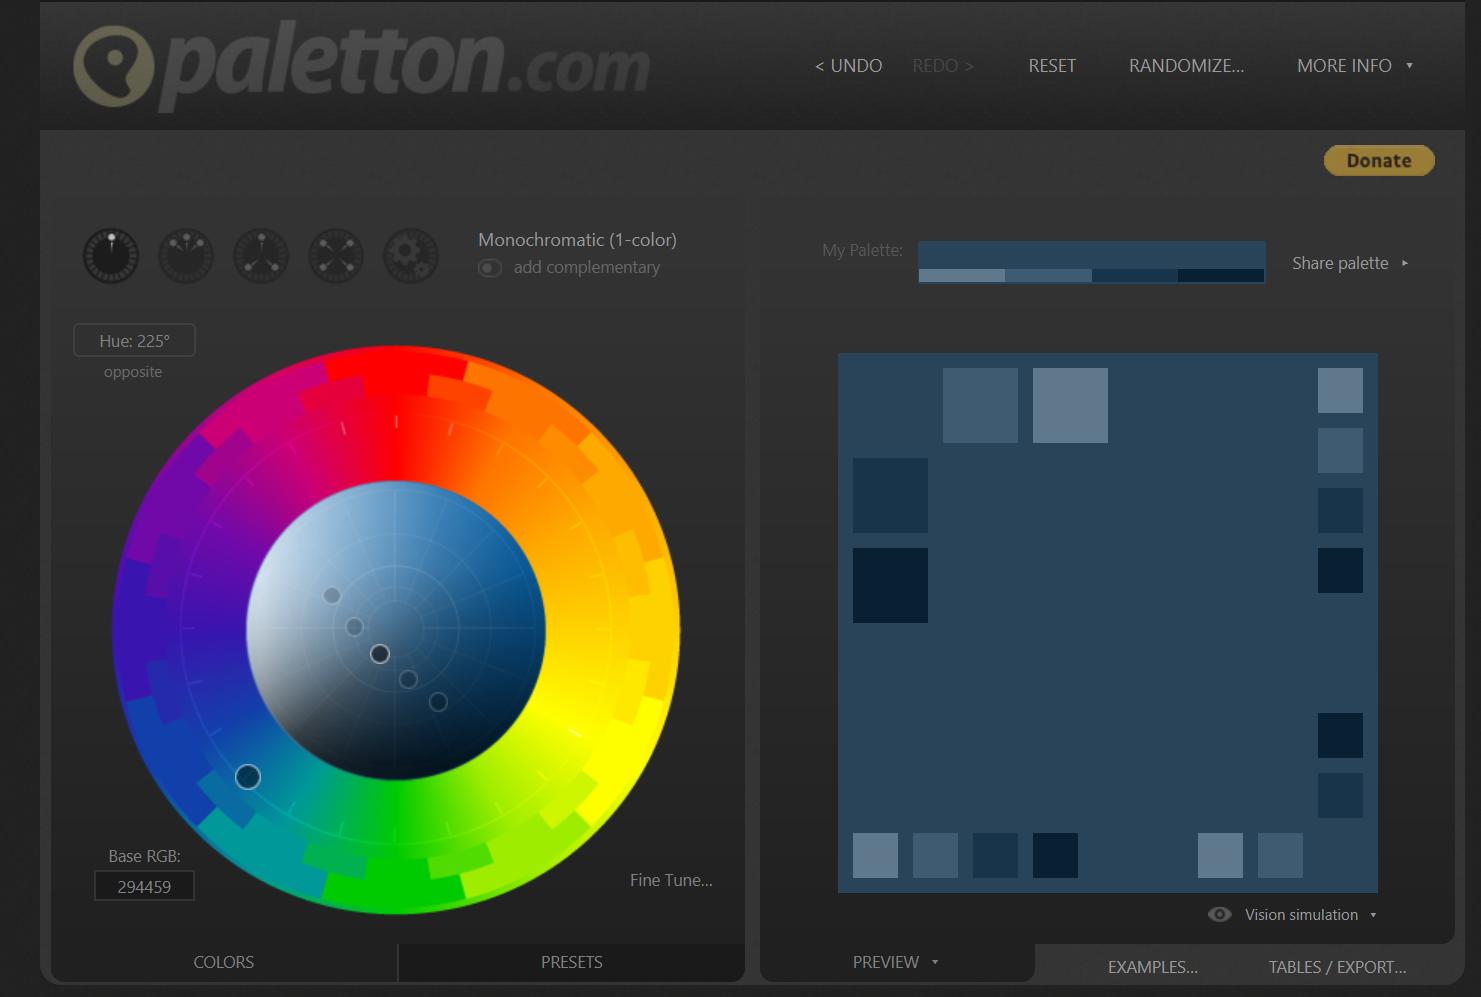 exemple site paletton